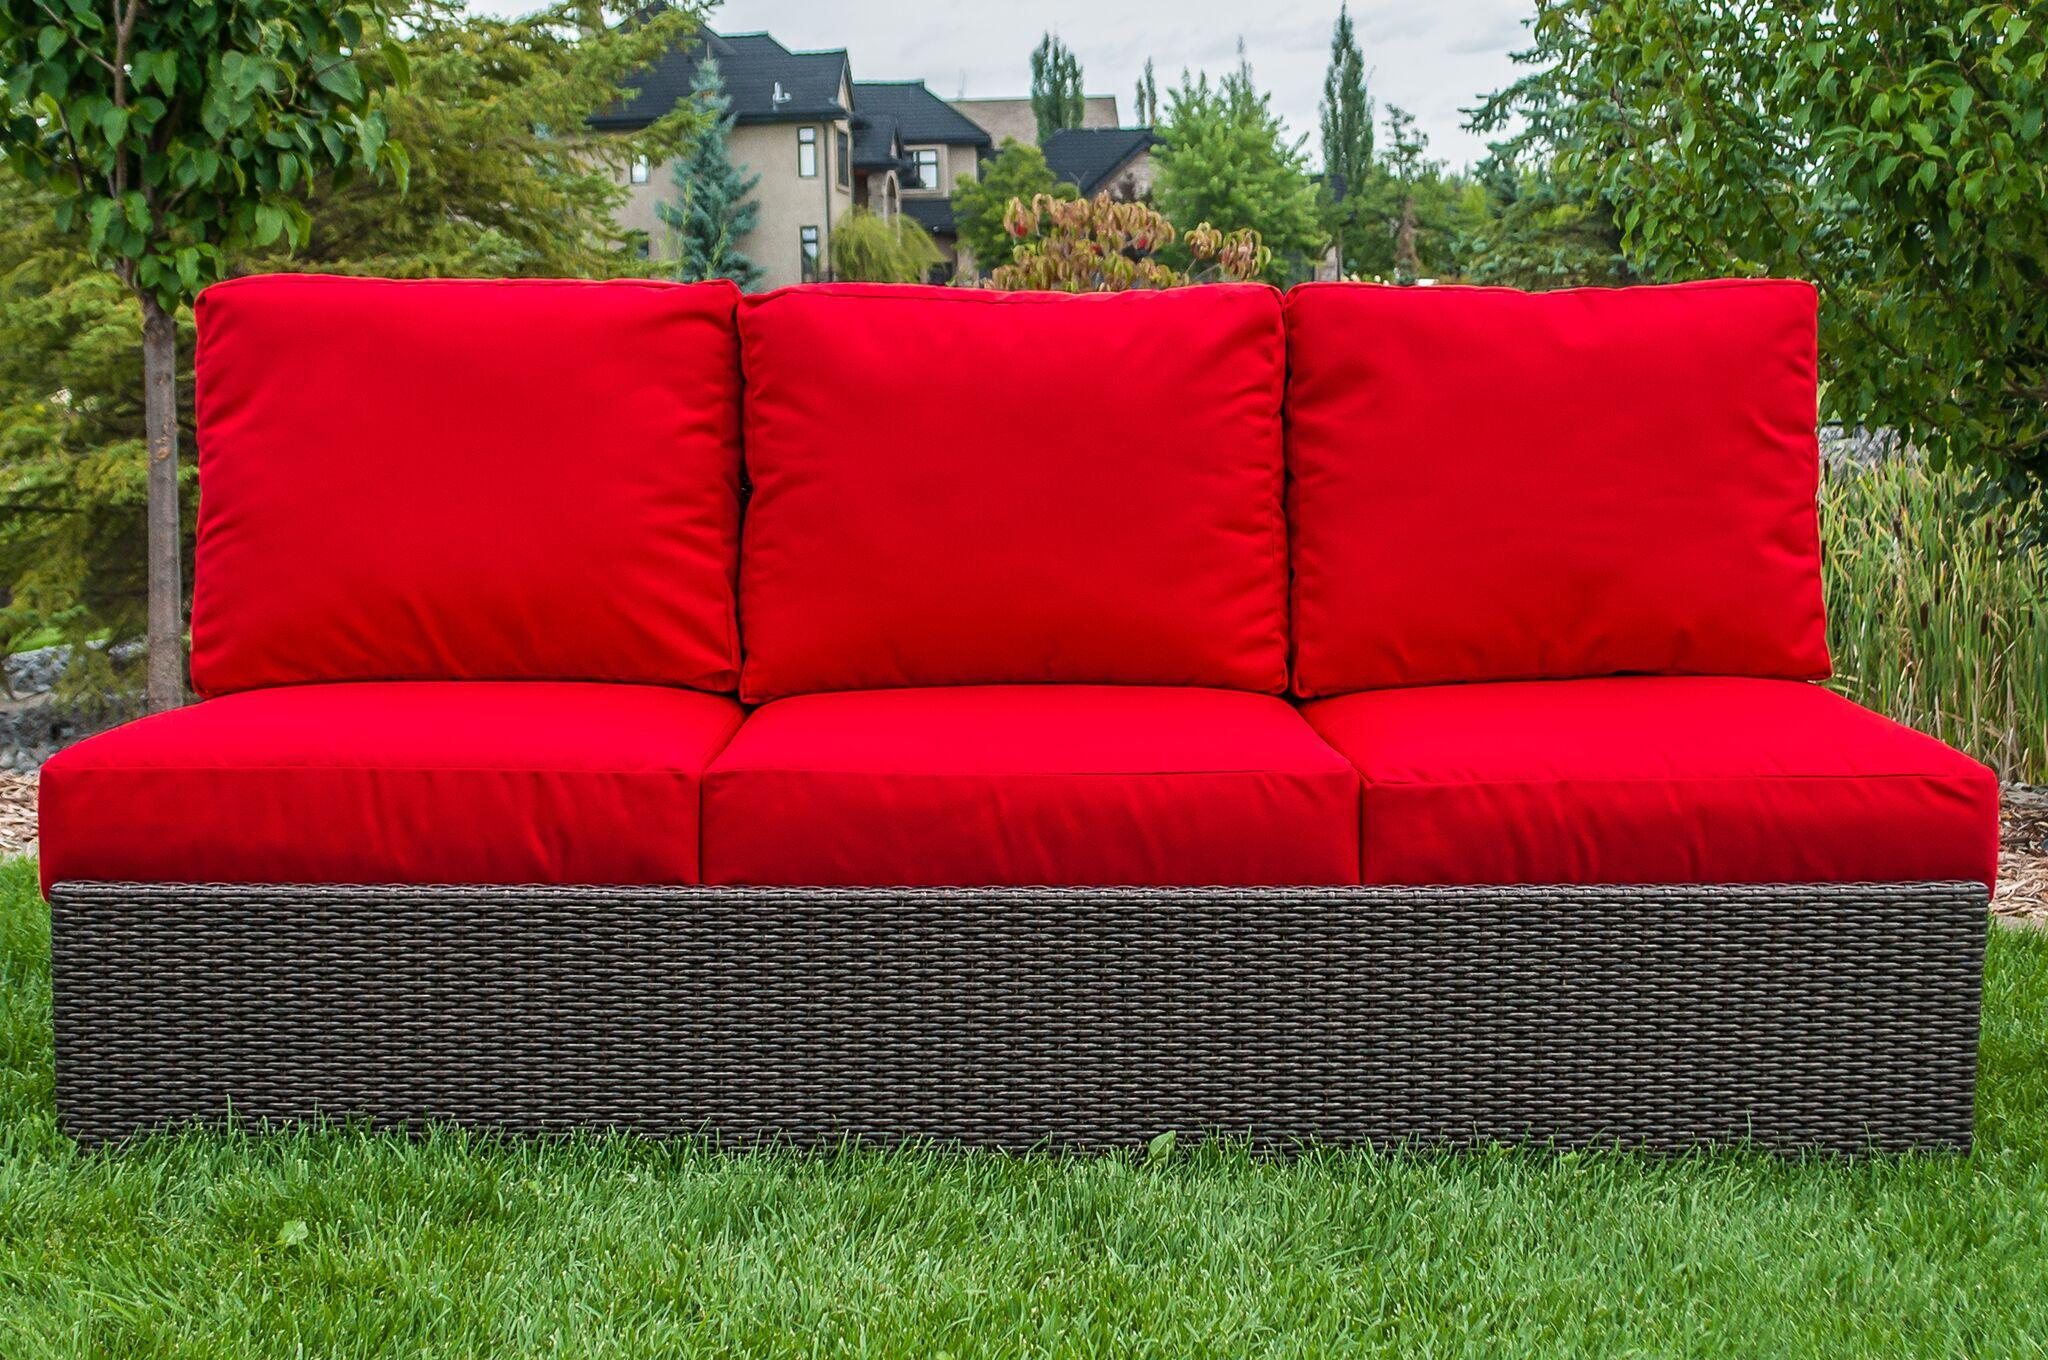 3 seat sofa | Featured Product | ORWW.CA .jpeg